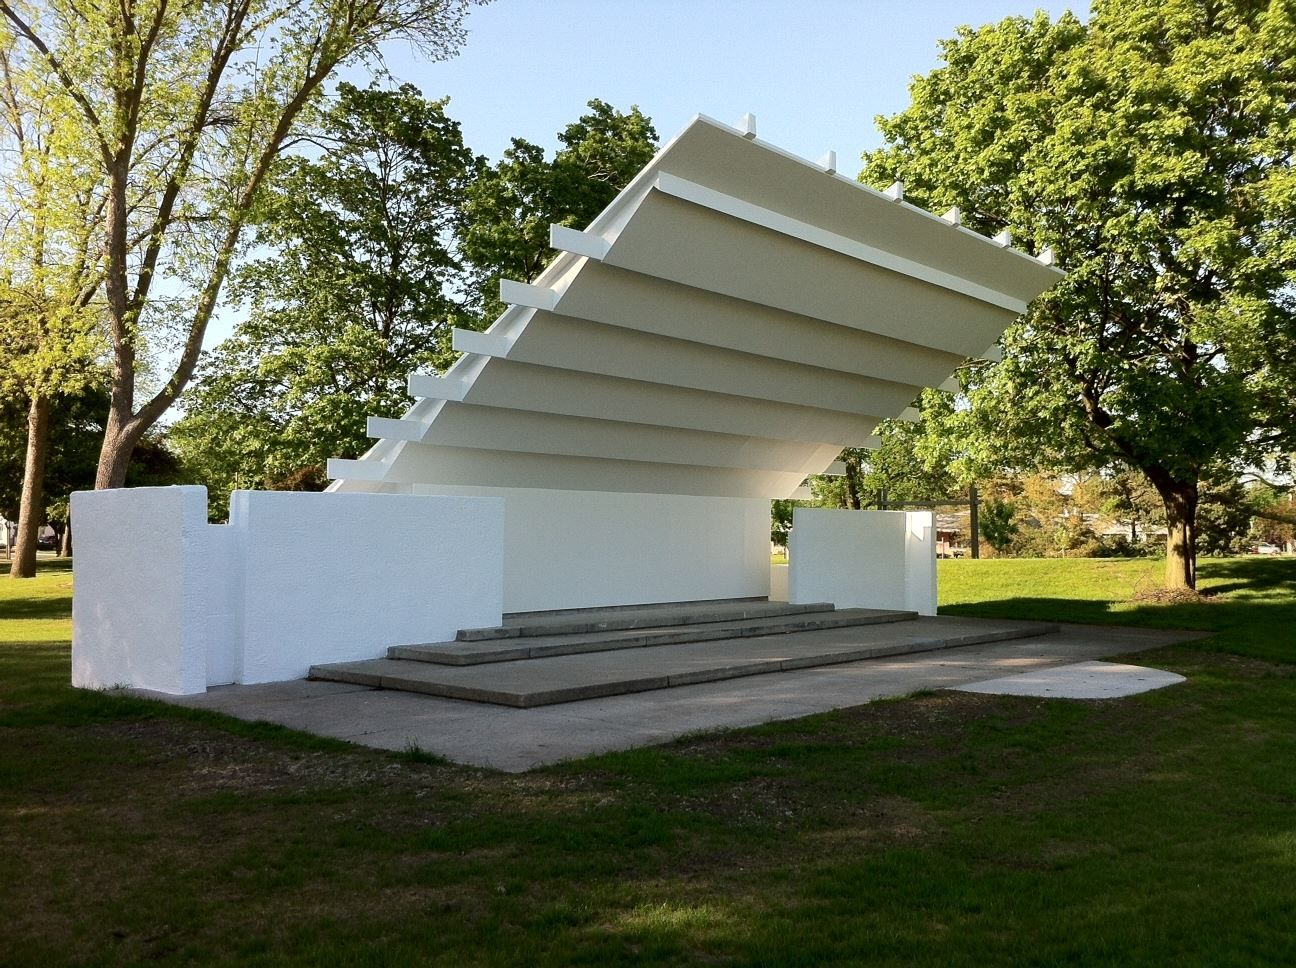 BANDSHELL Google Search Pavilion design, Outdoor